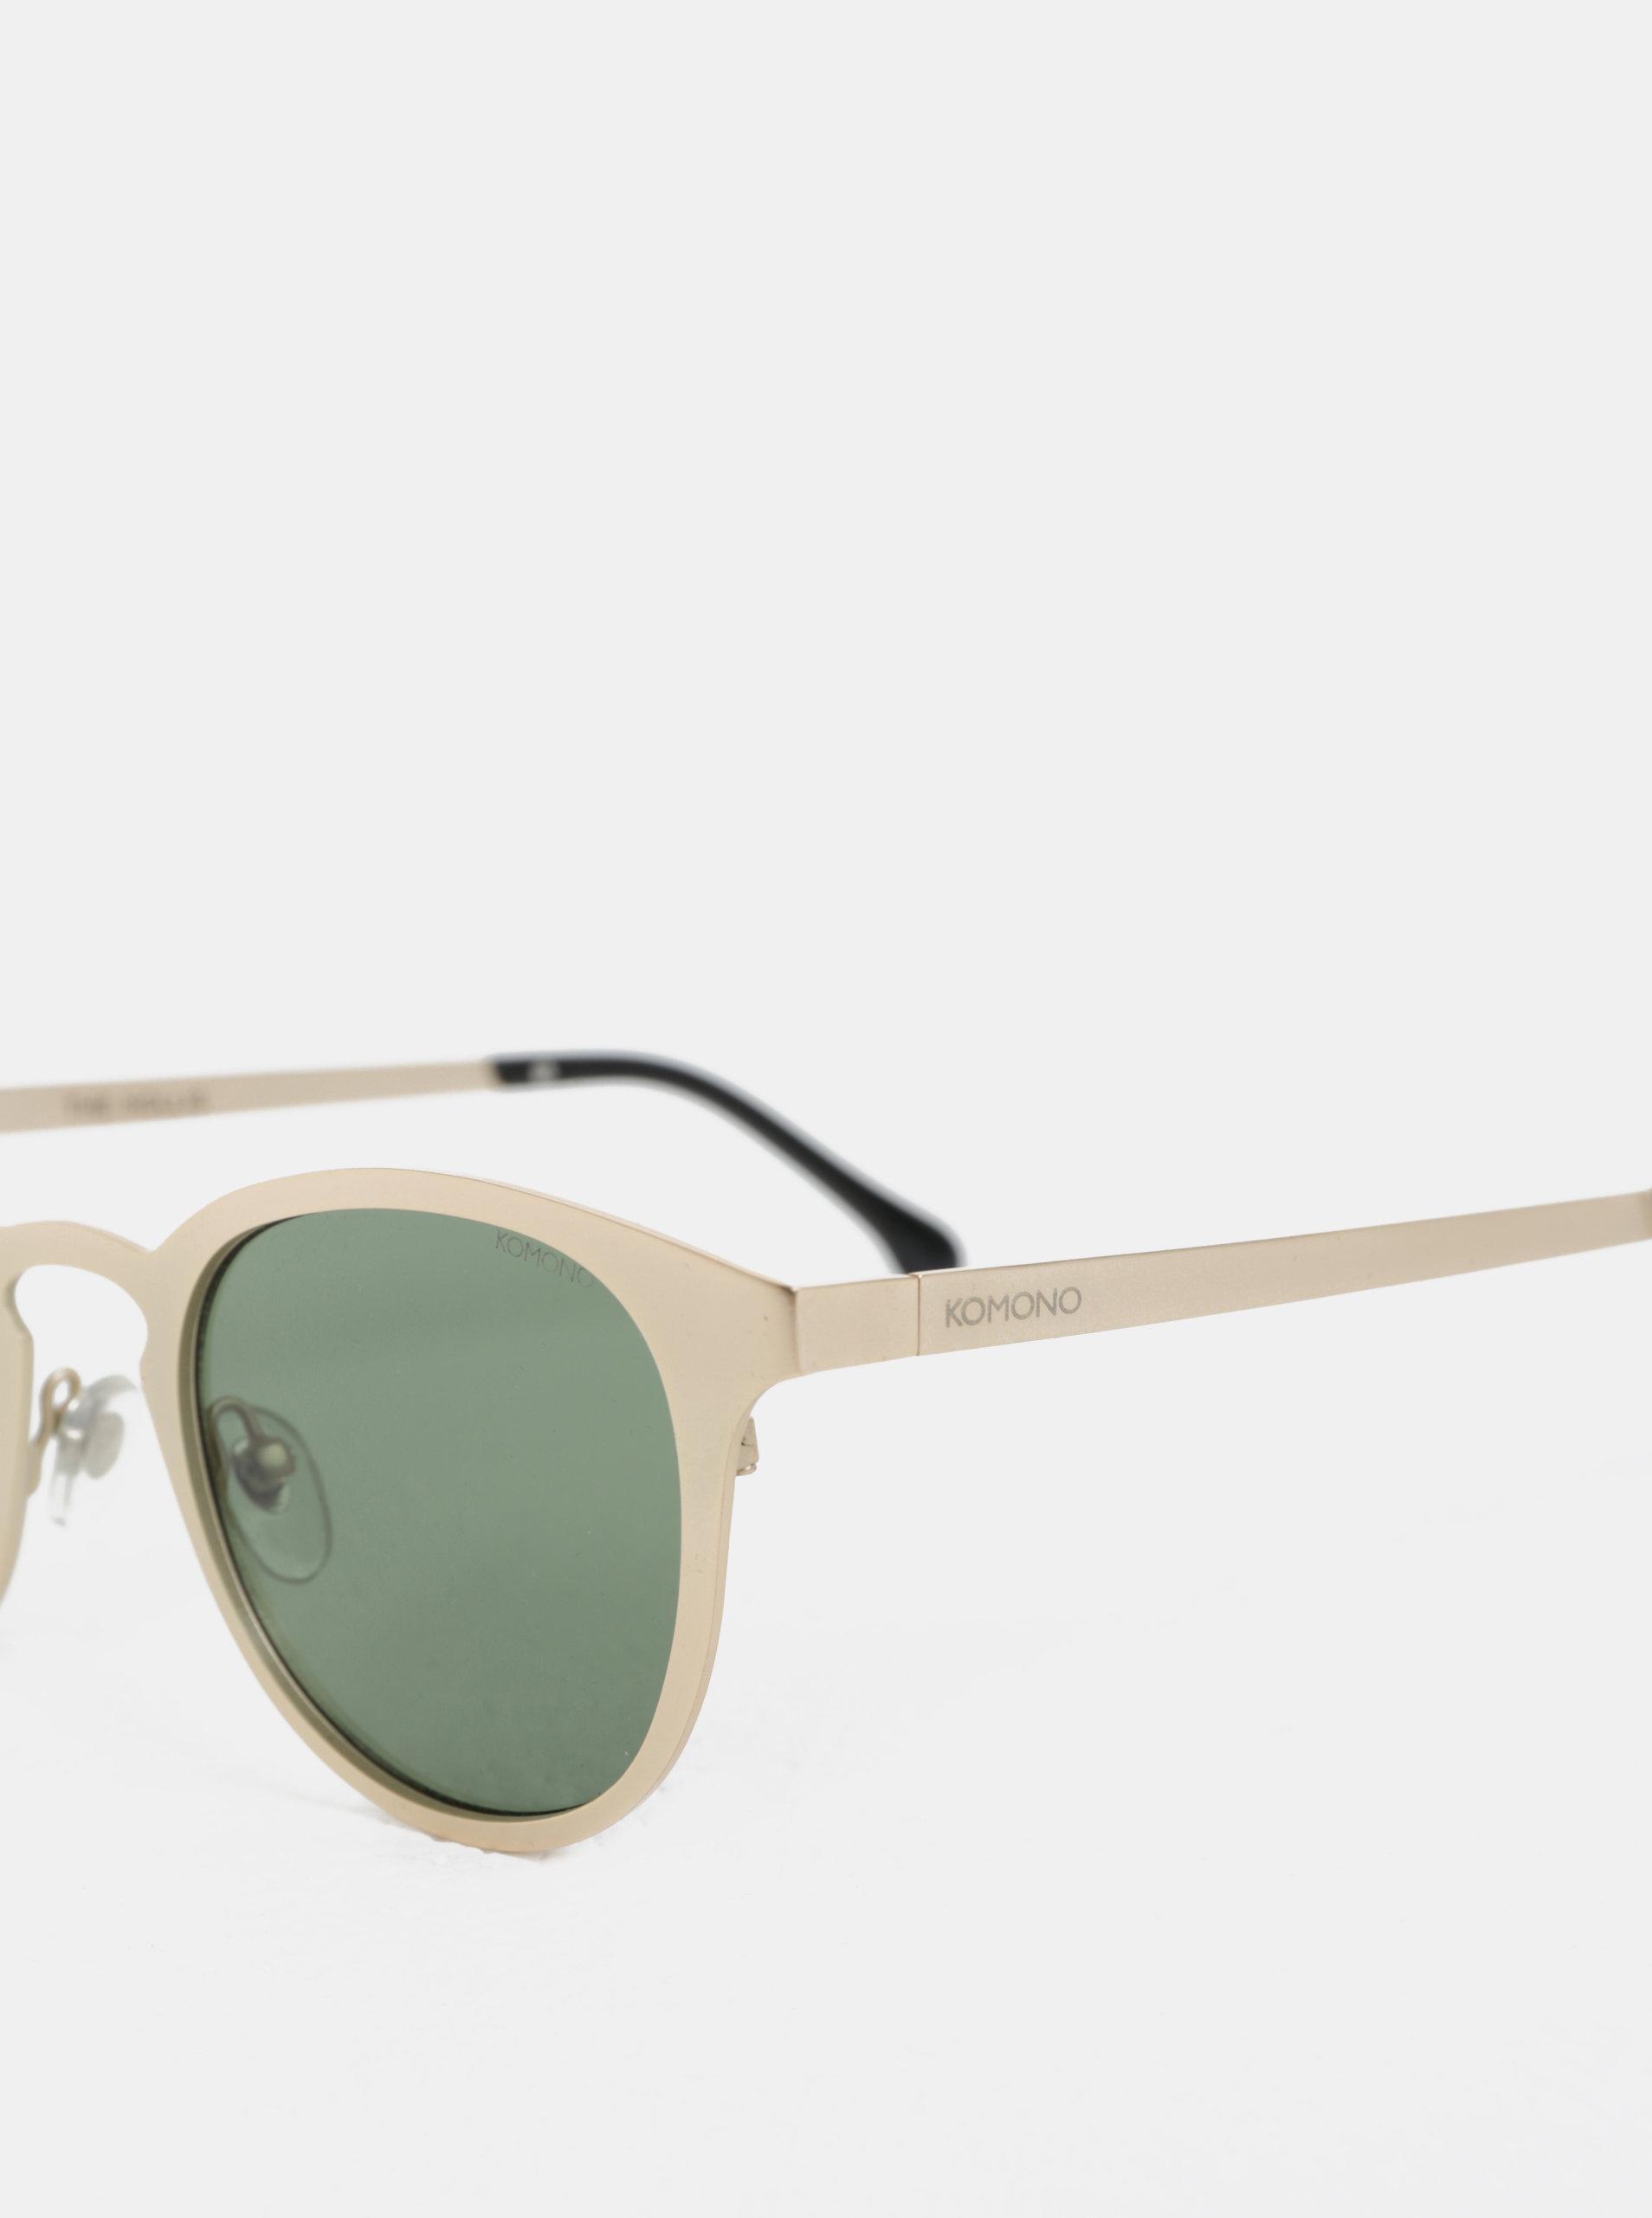 c7f036f88 Unisex slnečné okuliare v zlatej farbe Komono Hollis ...